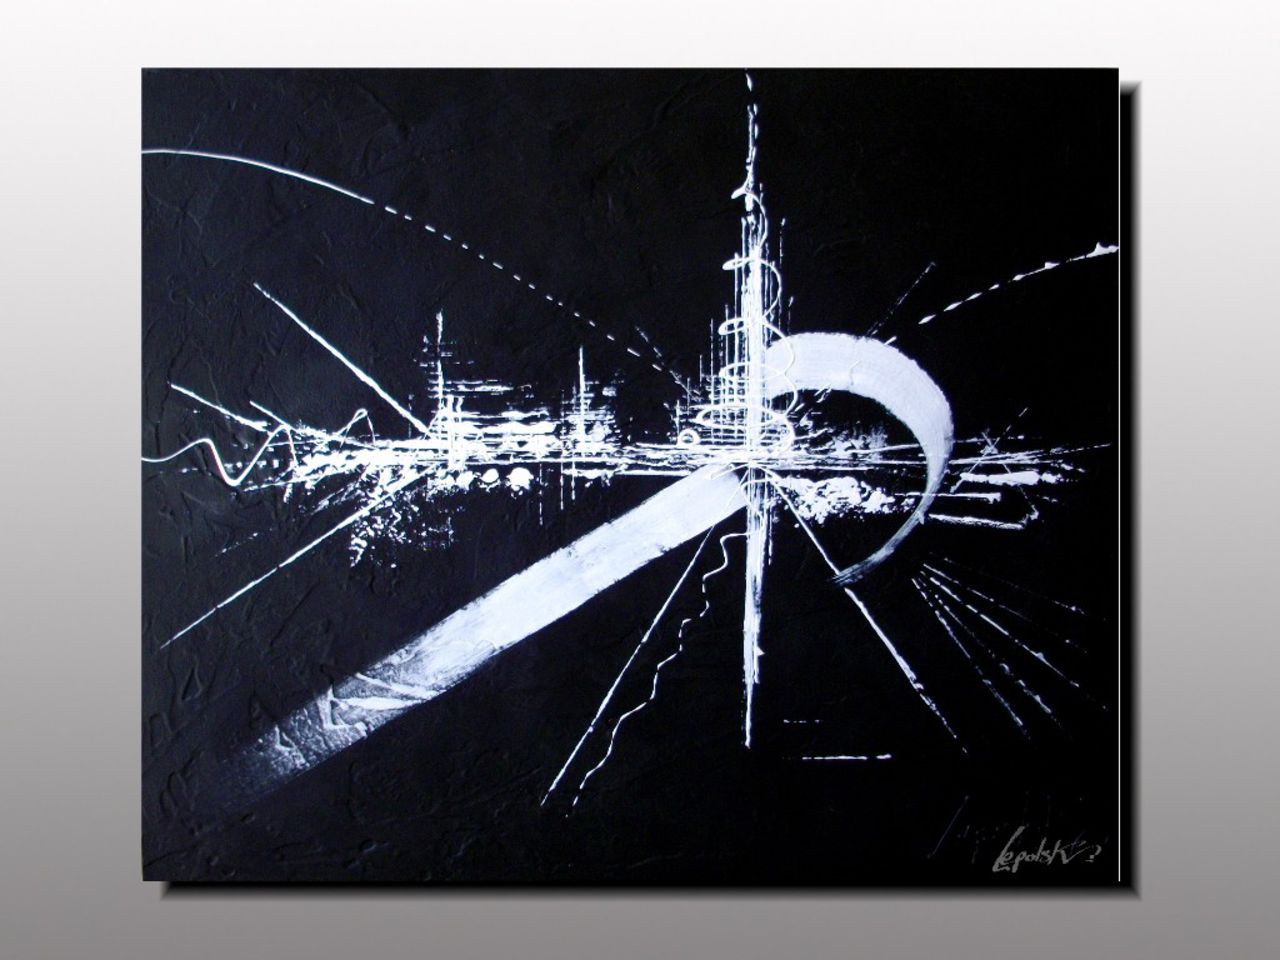 MISTER K  (Lepolsk Matuszewski) ARCHETYPE   Dripping Art abstrait